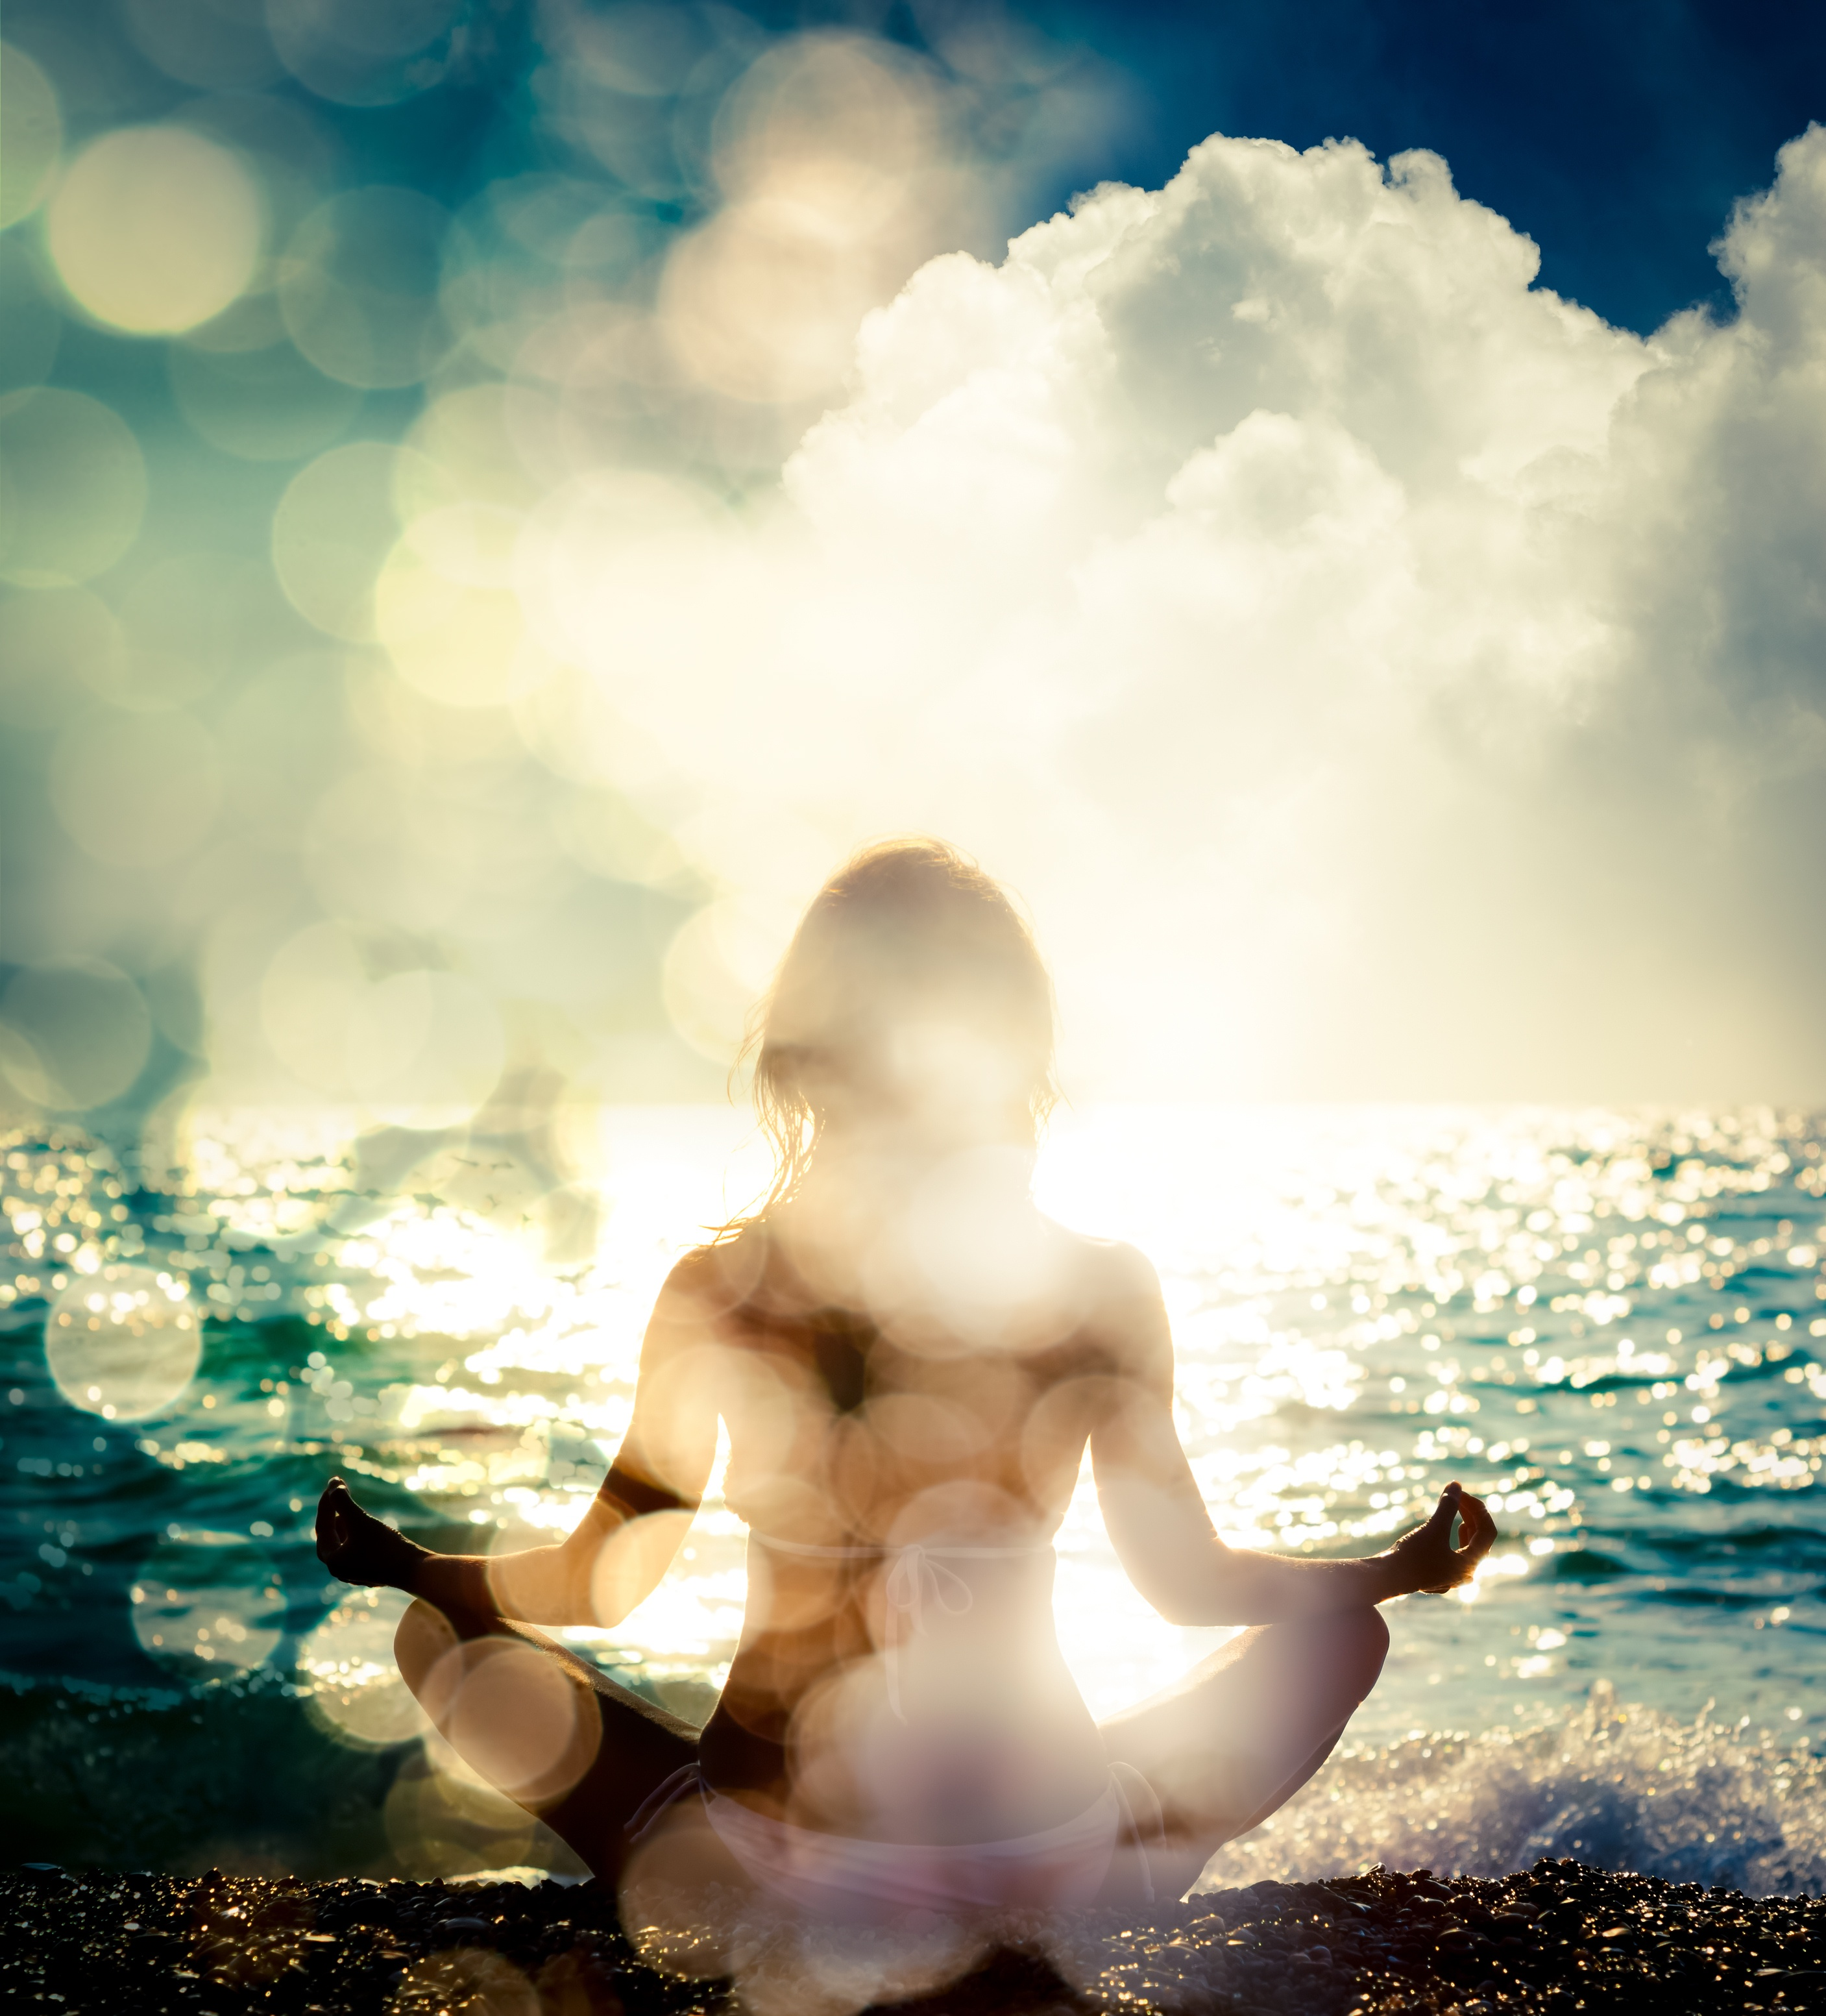 Woman-Practicing-Yoga-by-the-Sea.-Bokeh-Background-617569776_2814x3106.jpeg